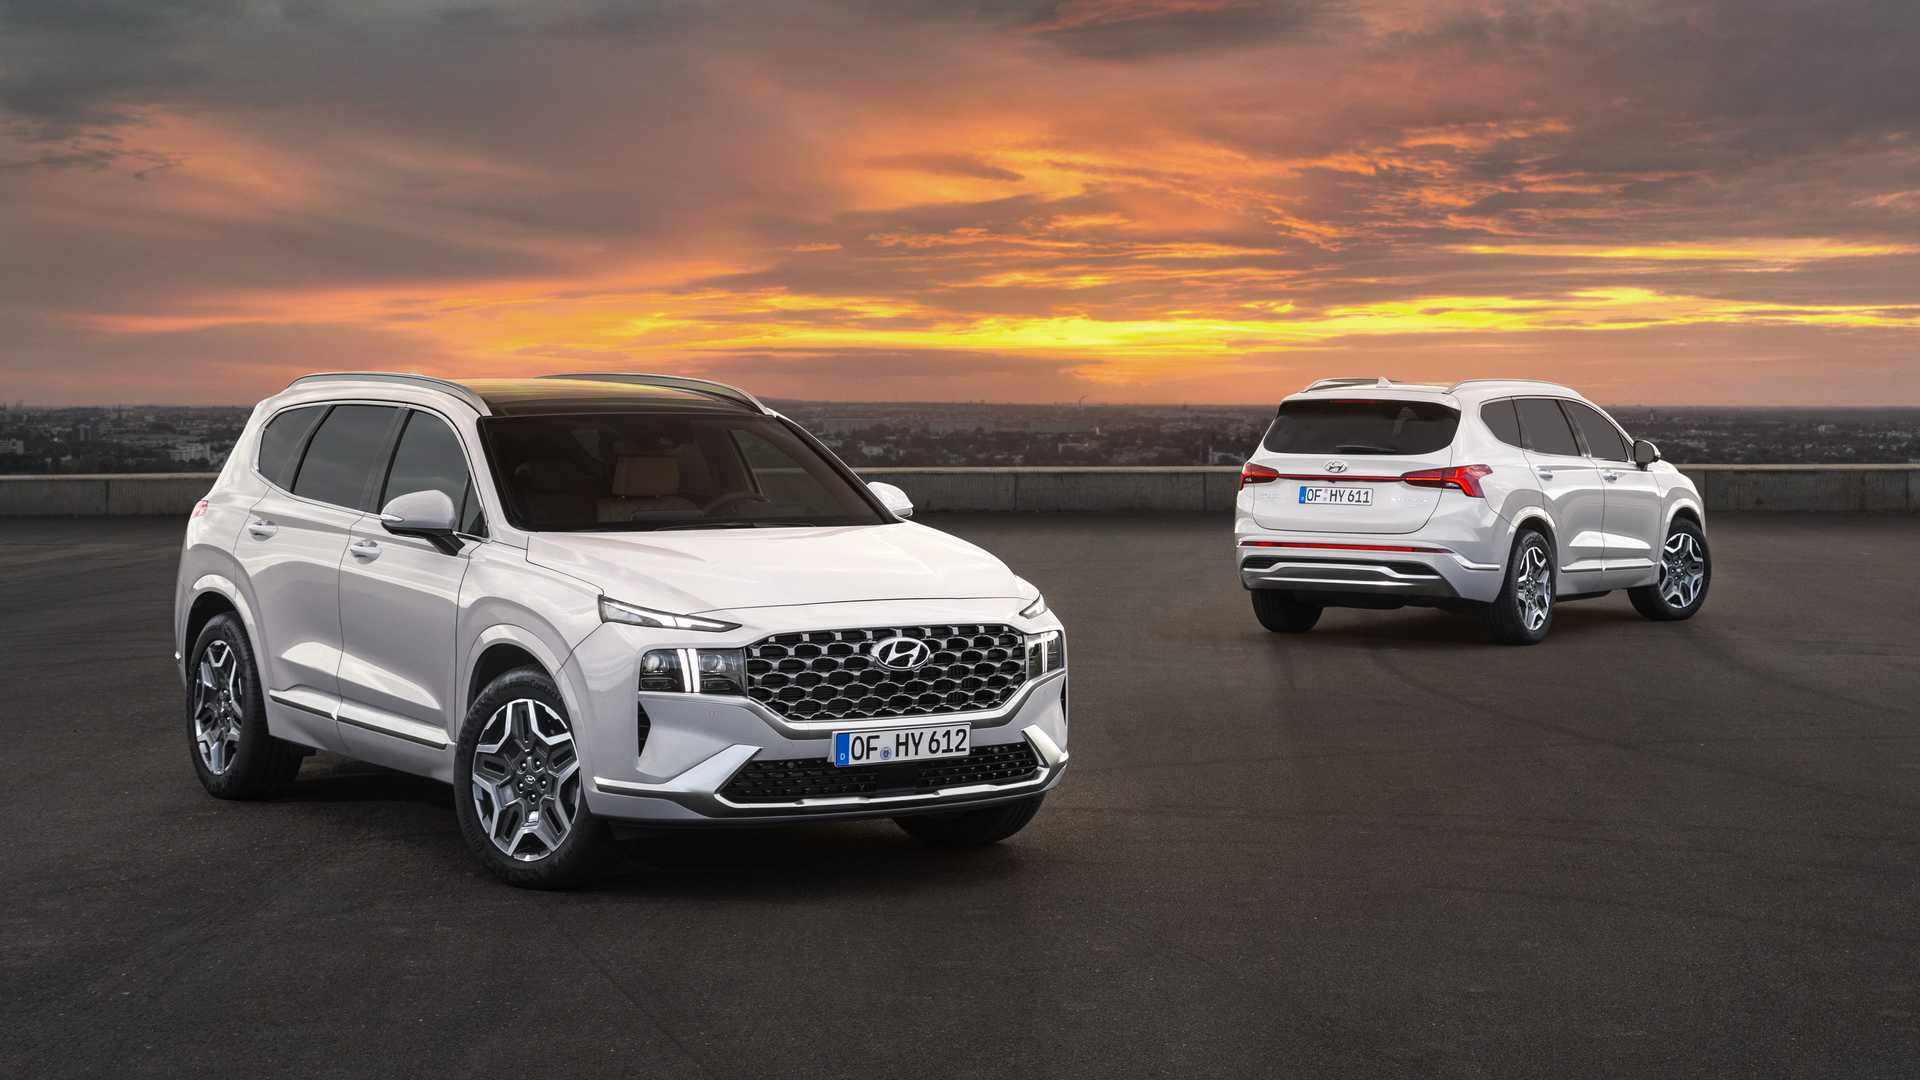 Hyundai Santa Fe Restyling (2020) 35